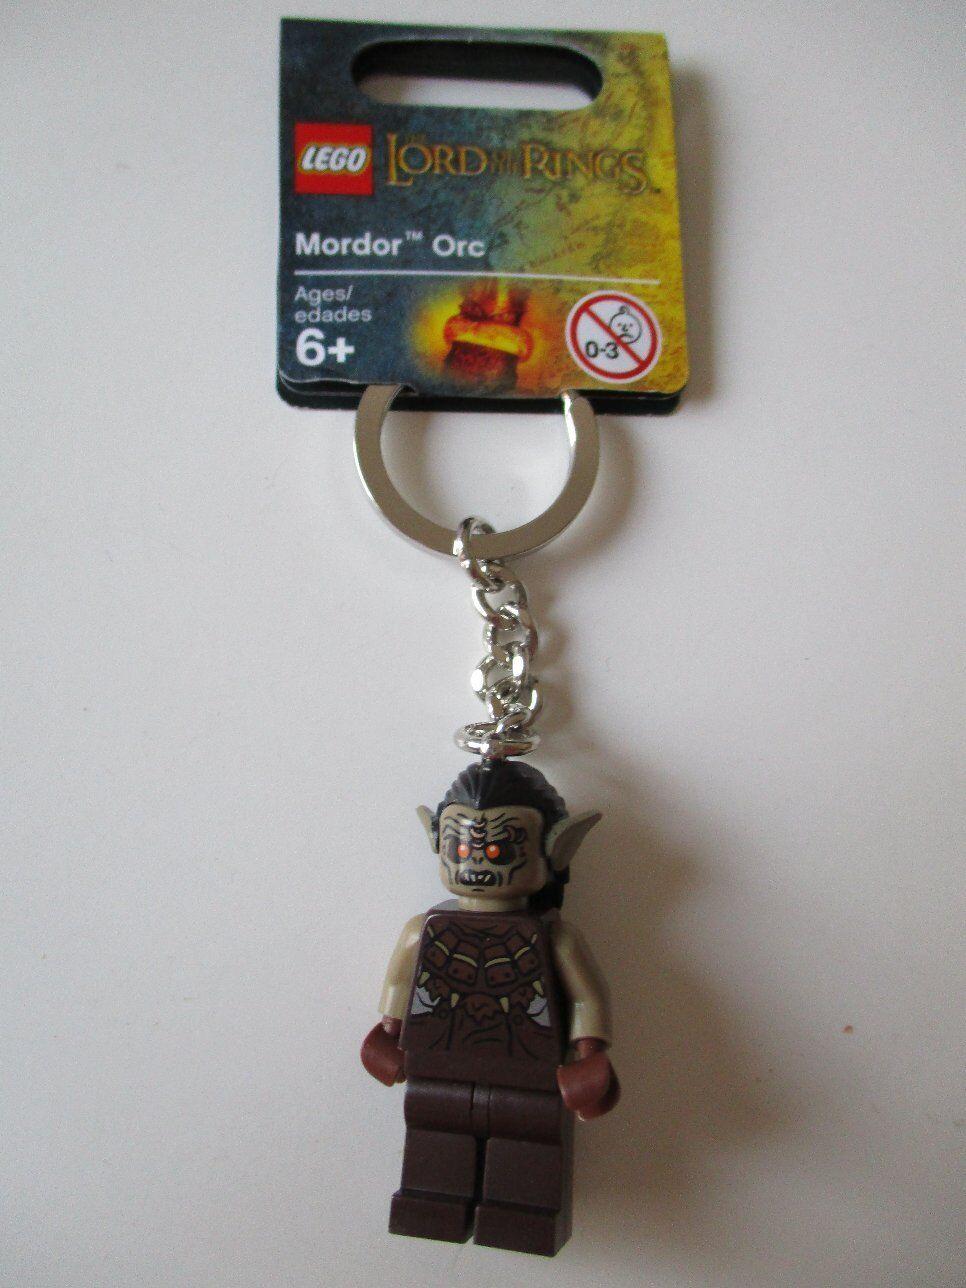 Lego Key Chain Porte Clés minifigur Lord of the Rings Rings Rings Mordor FAE Nouveau neuf dans sa boîte | Bradées  27ffc4